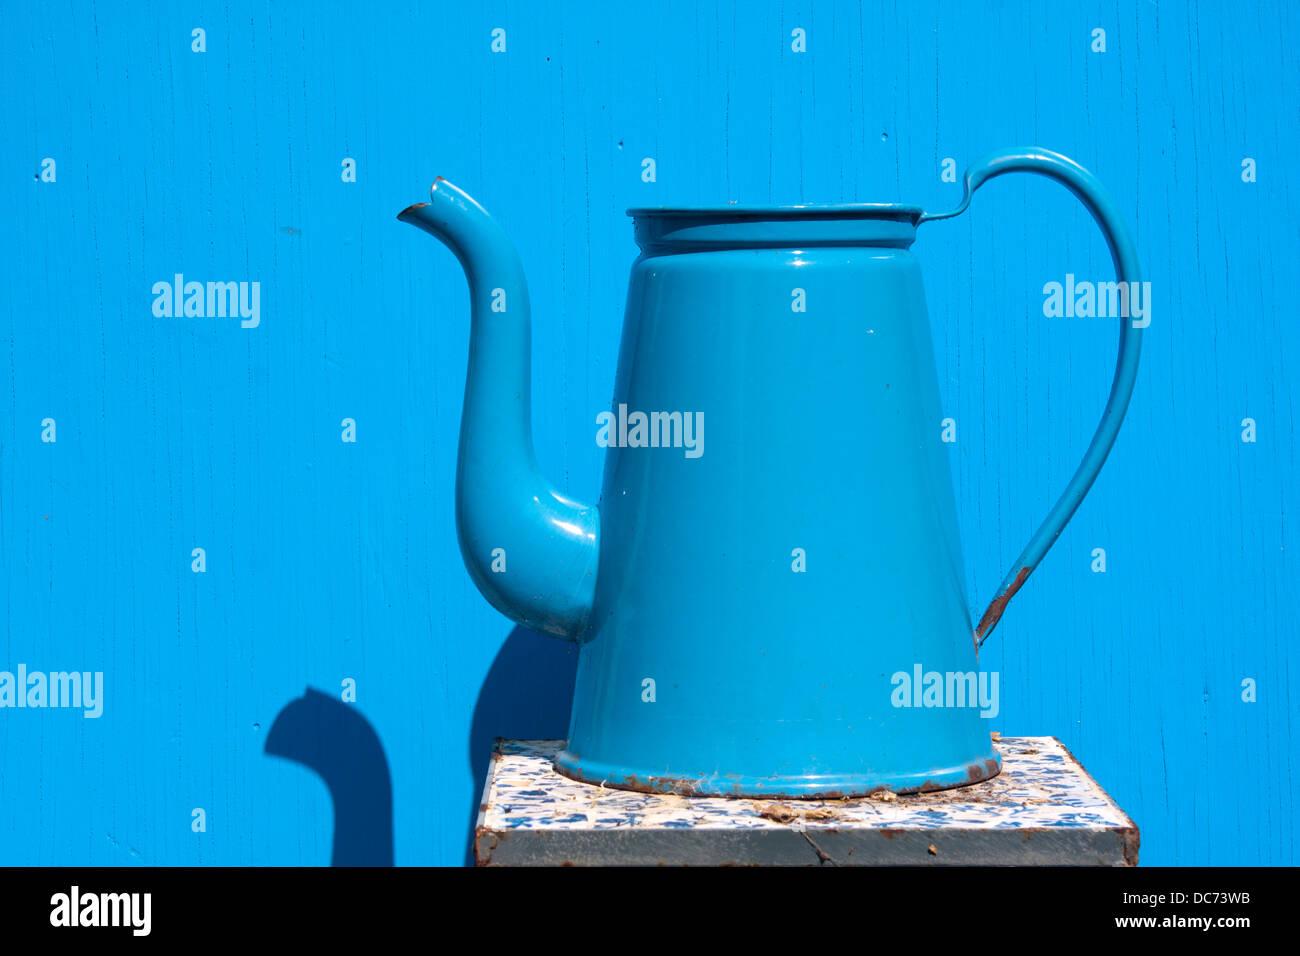 Madam blue enamel coffee pot - Stock Image